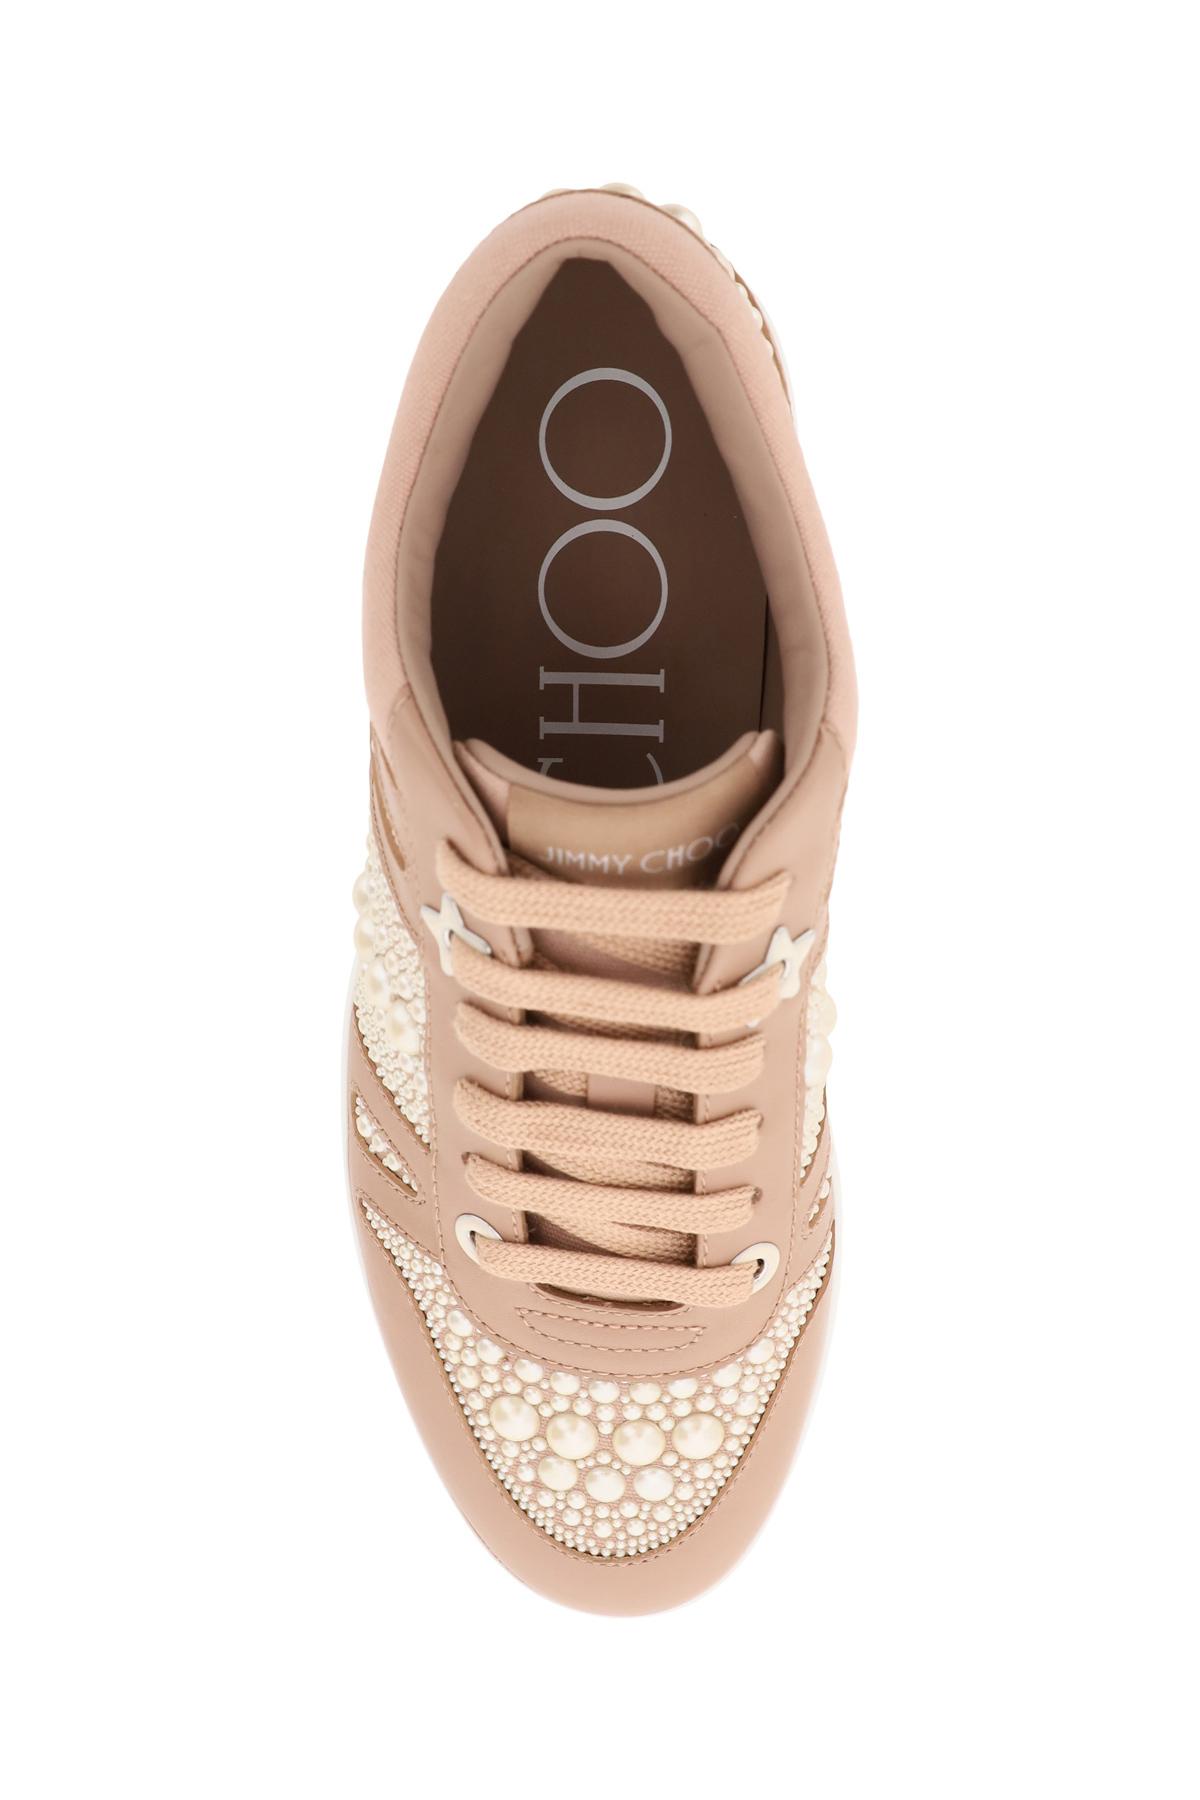 Jimmy choo sneakers hawaii con perle